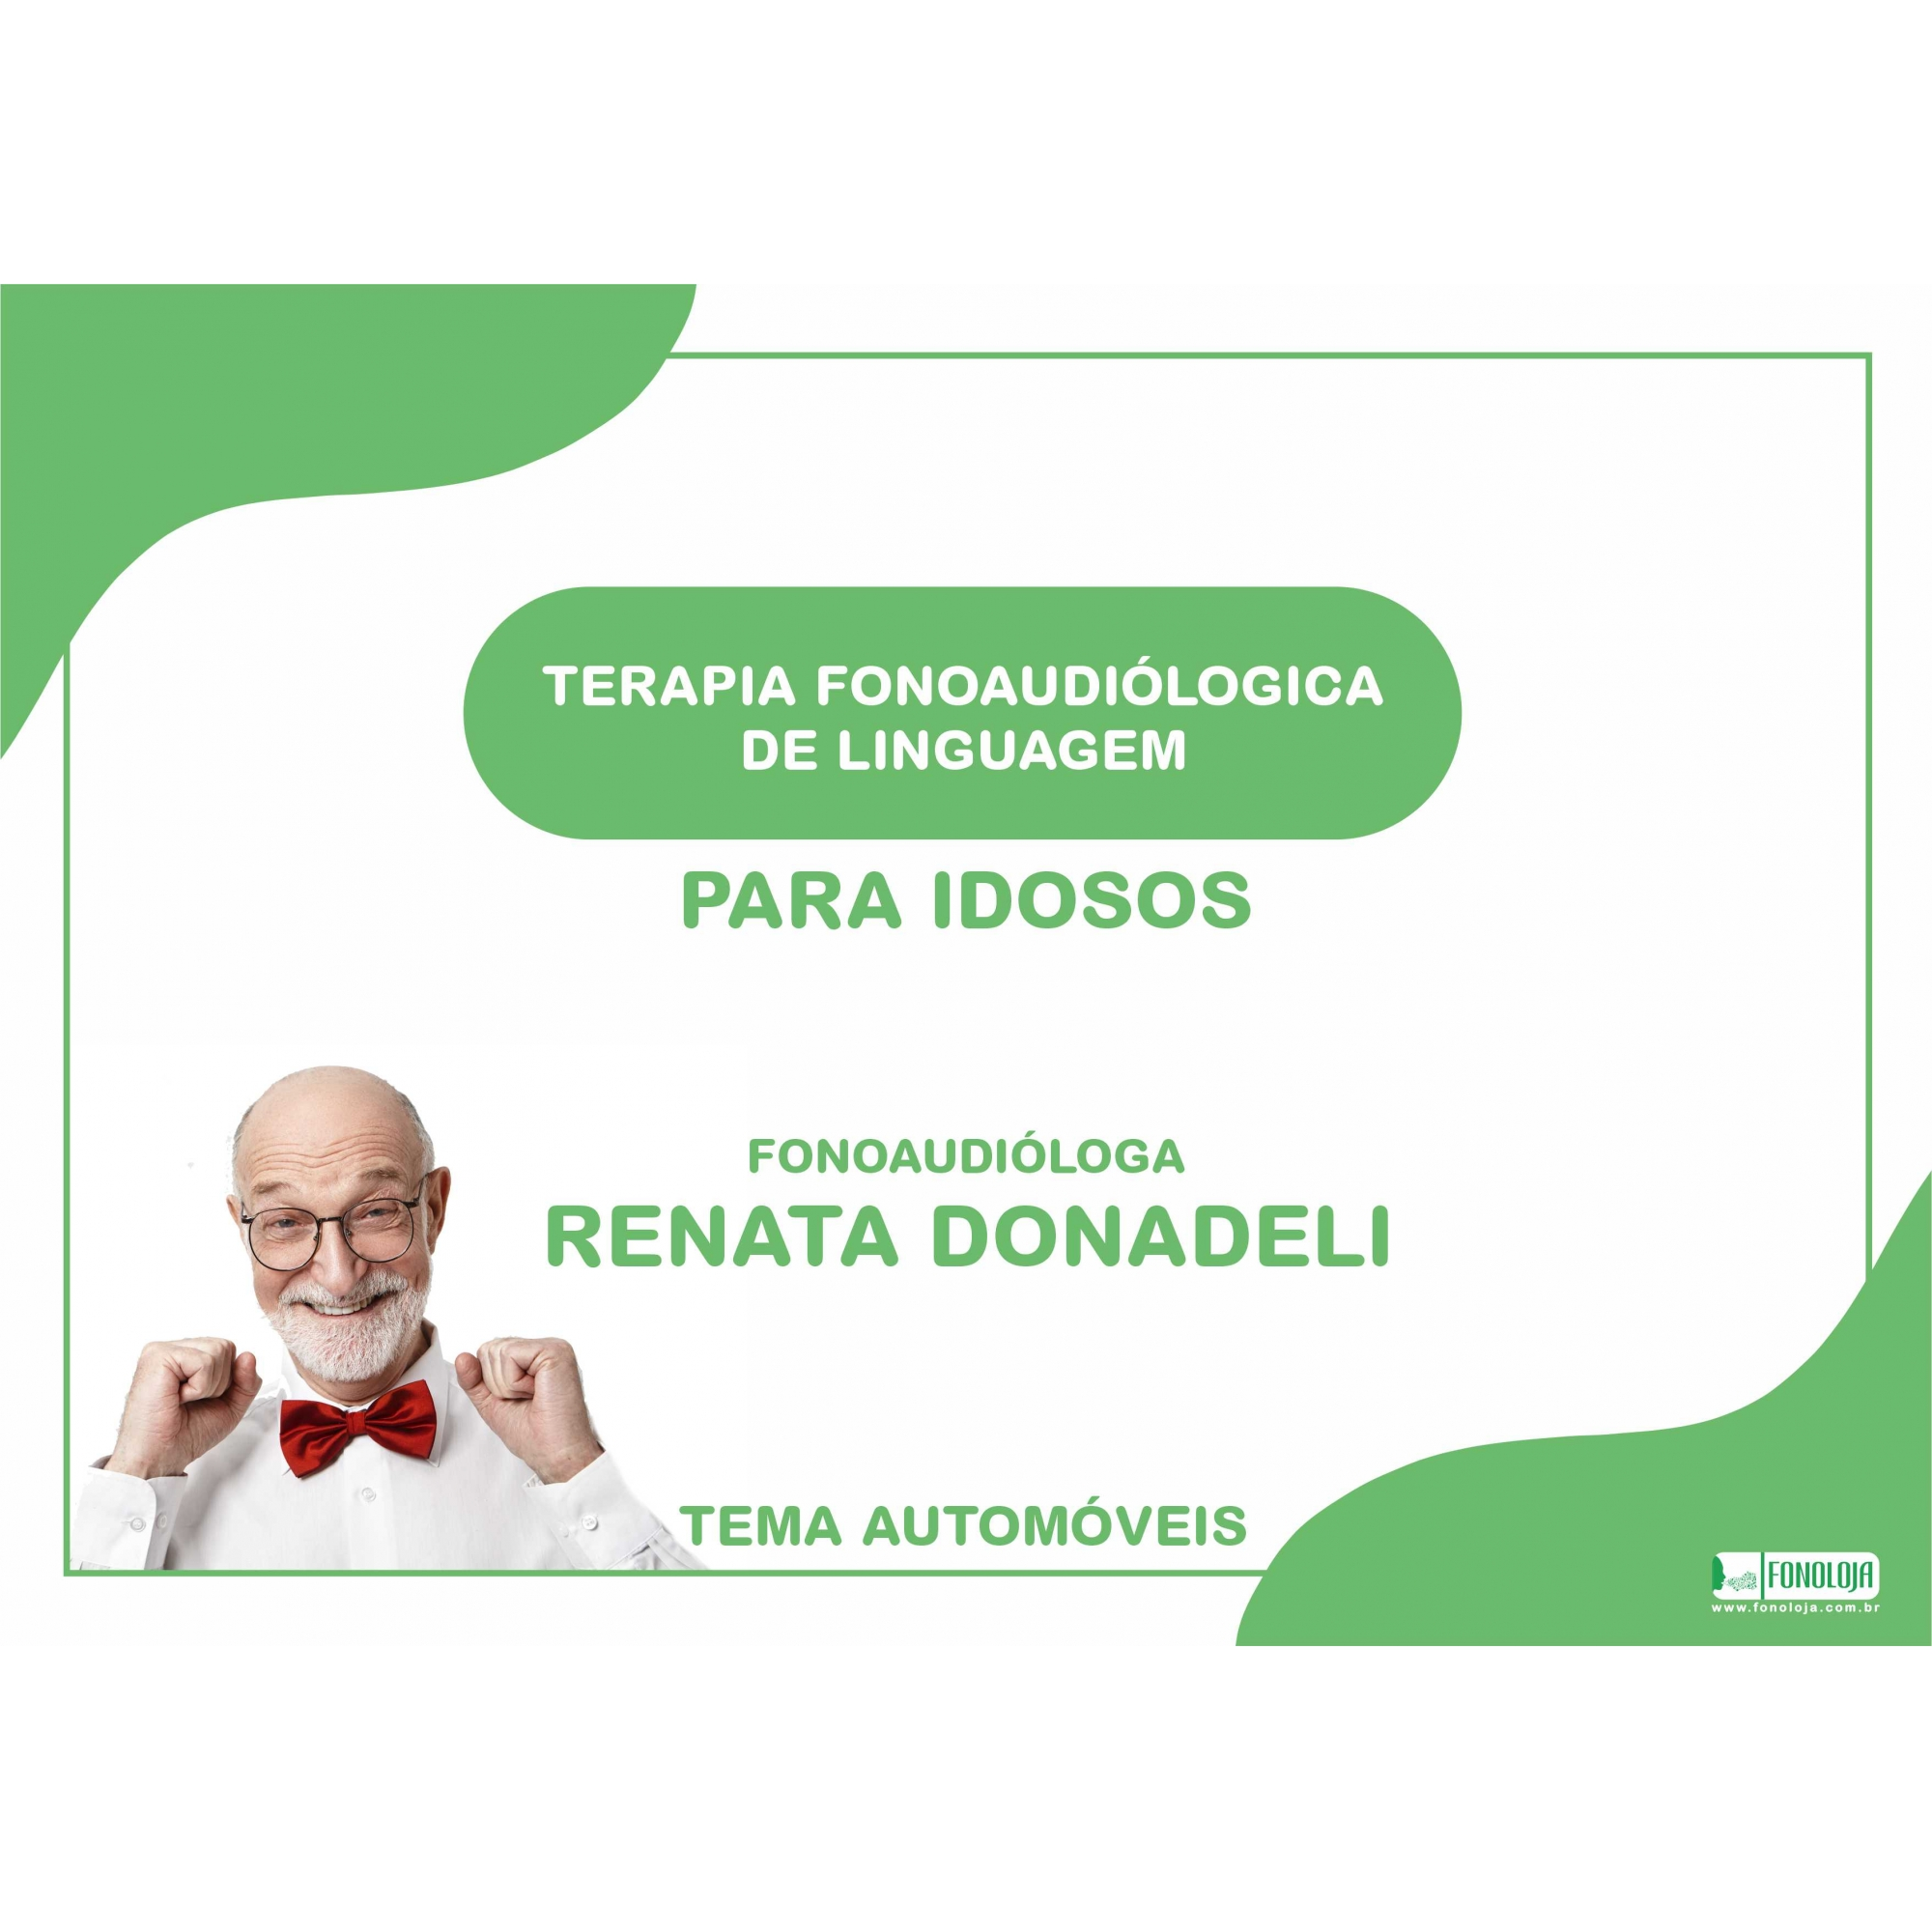 PASTA DE TERAPIA FONOAUDIÓLOGICA PARA IDOSOS - MATERIAL DIGITAL